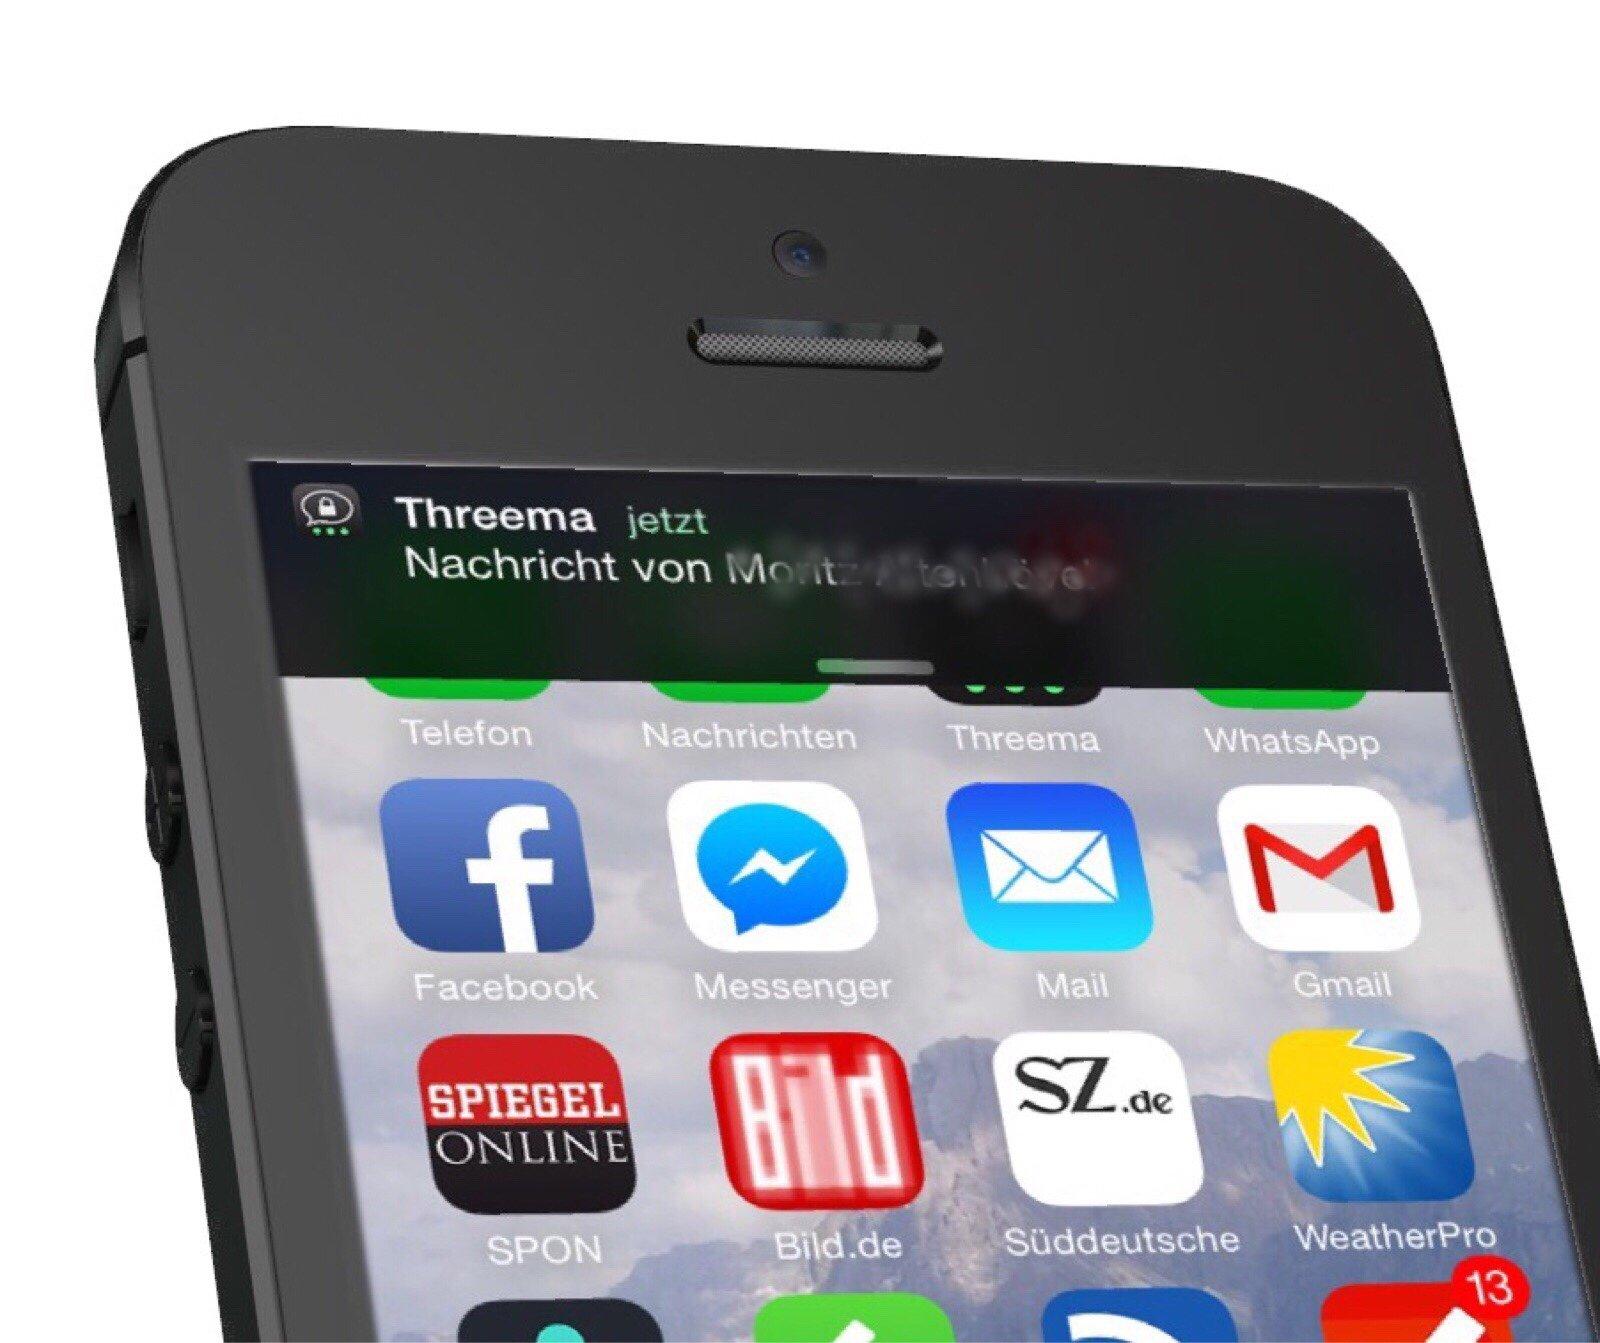 iPhone-App-Threema-Absender-Name-Benutzer-2.jpg